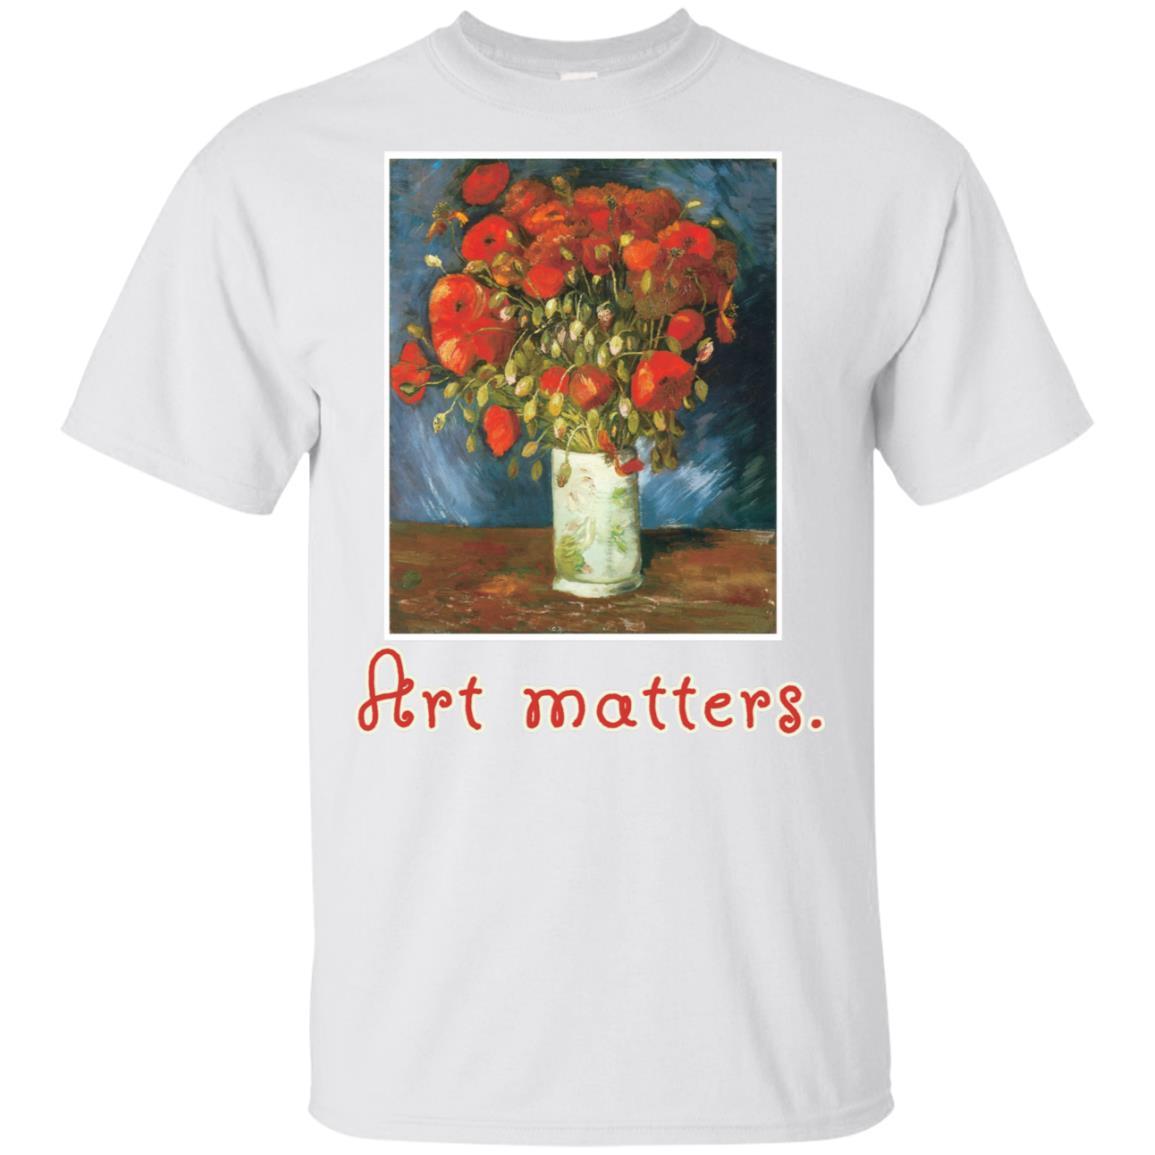 Van Gogh Red Poppies Unisex Short Sleeve